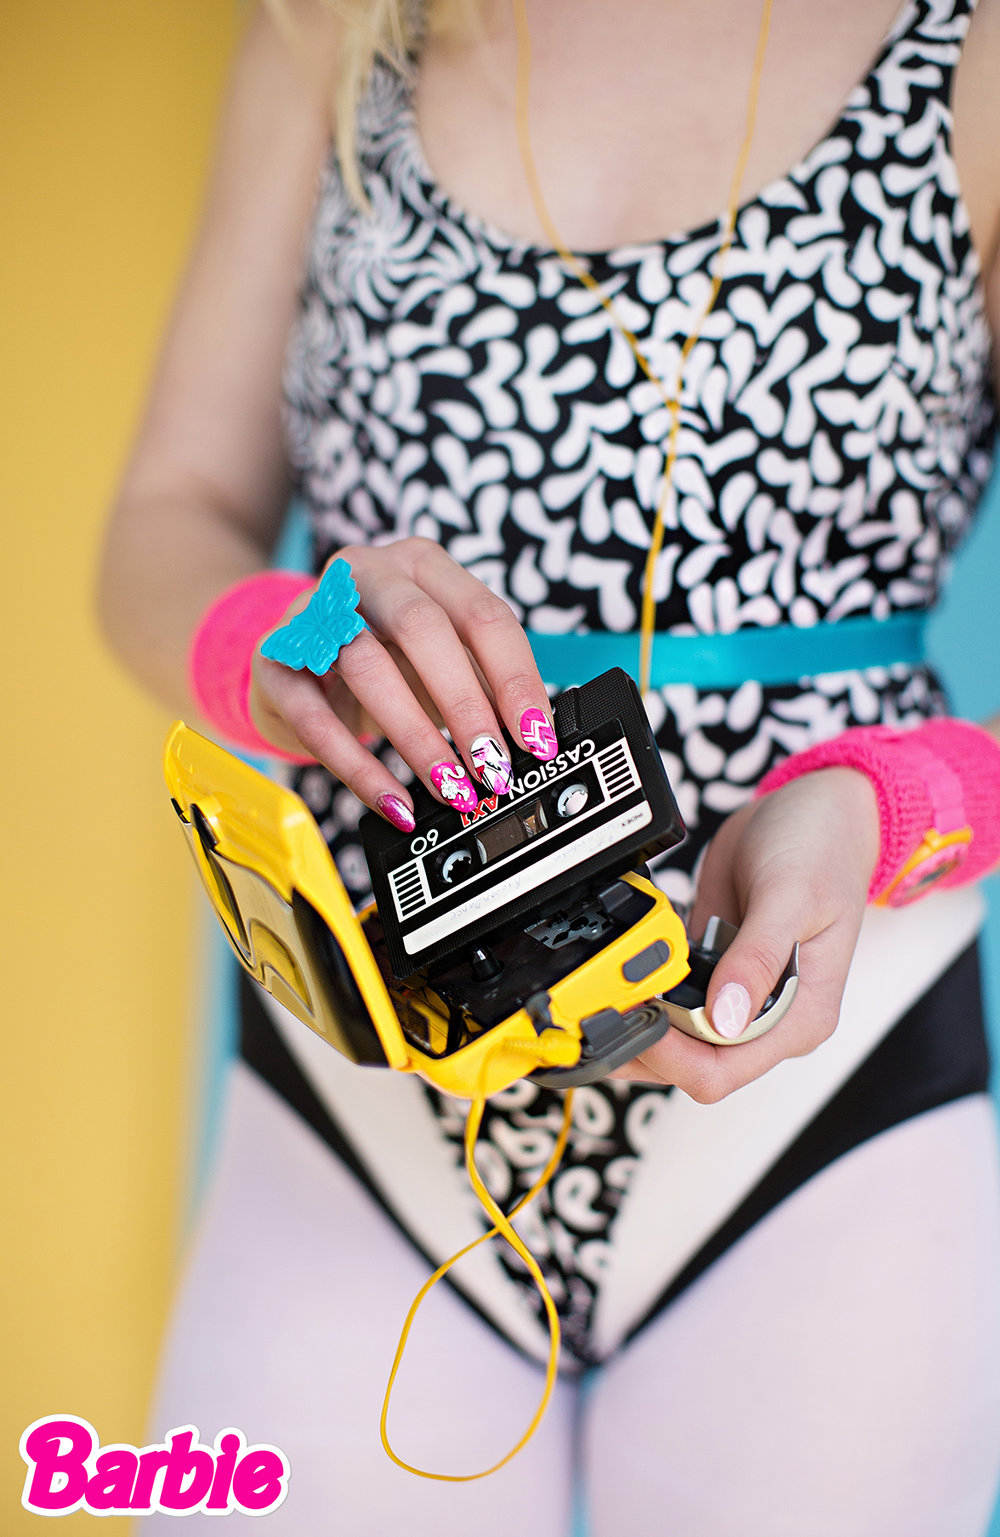 BarbieWorkout26.jpg